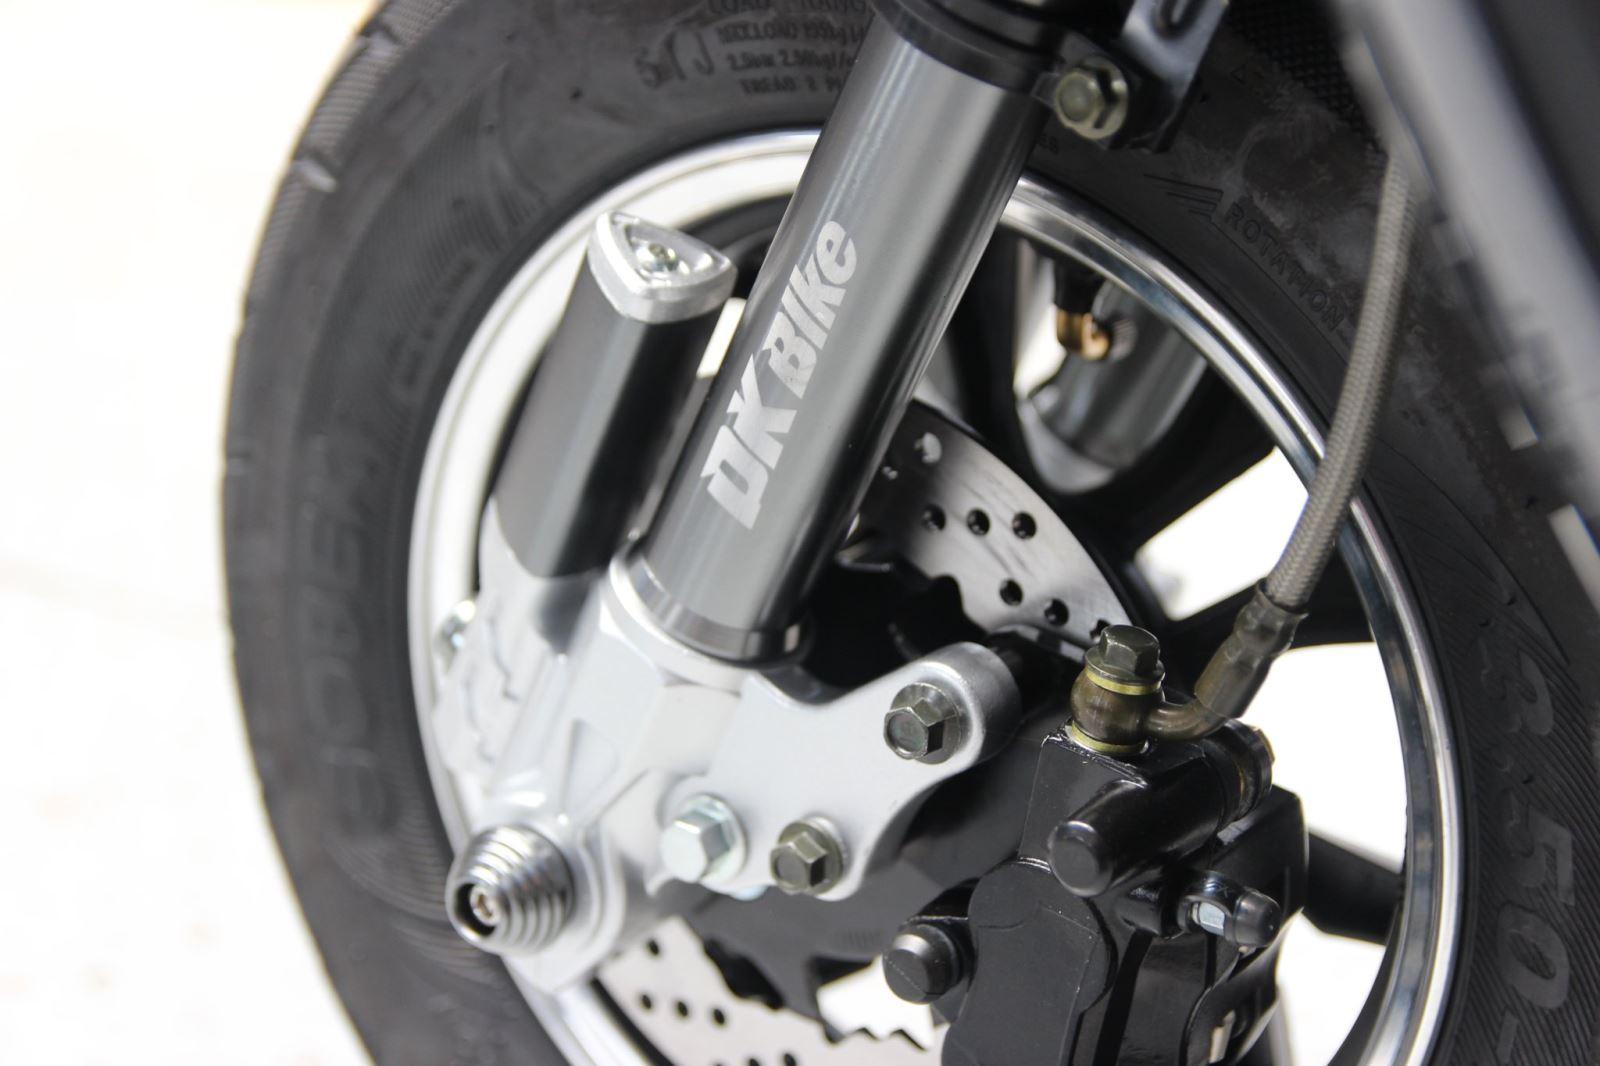 phanh xe máy